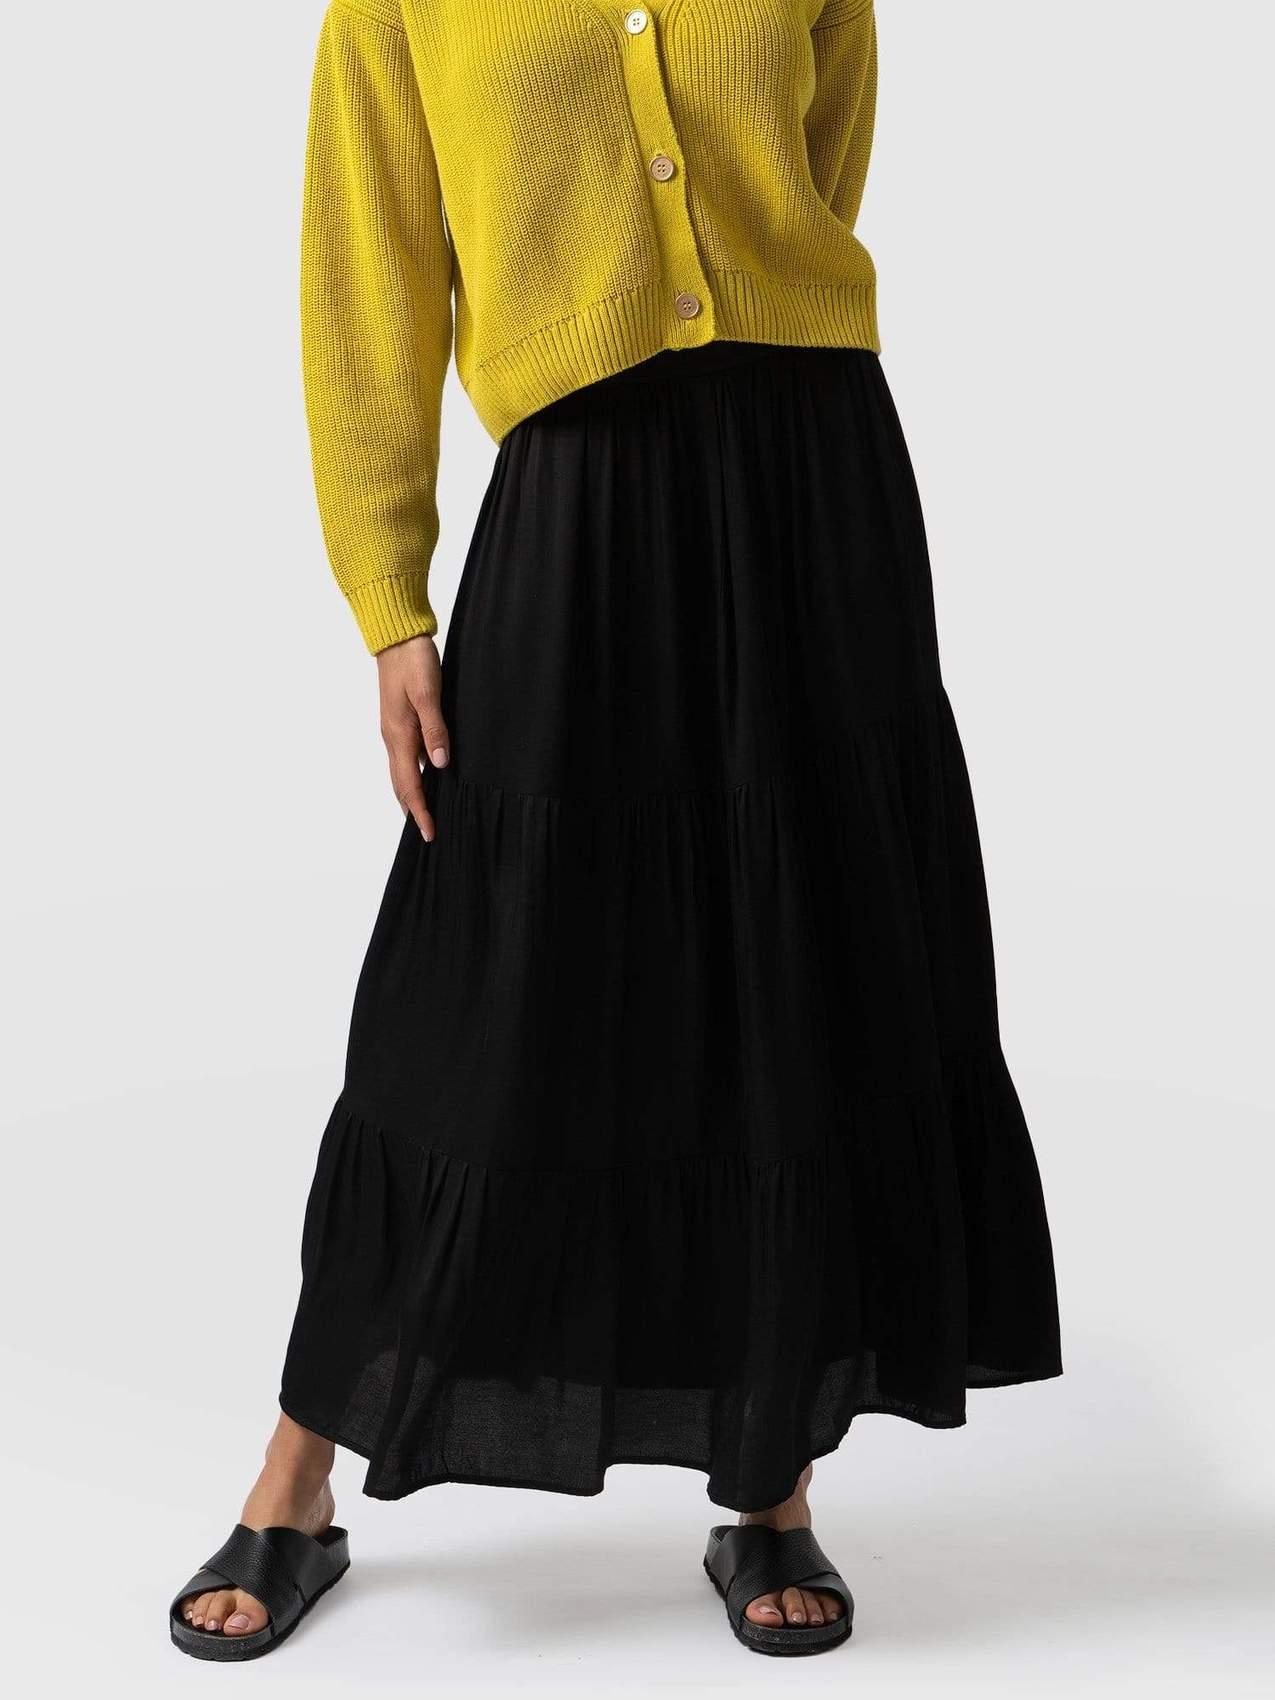 my midlife fashion, saint and Sofia greenwich skirt